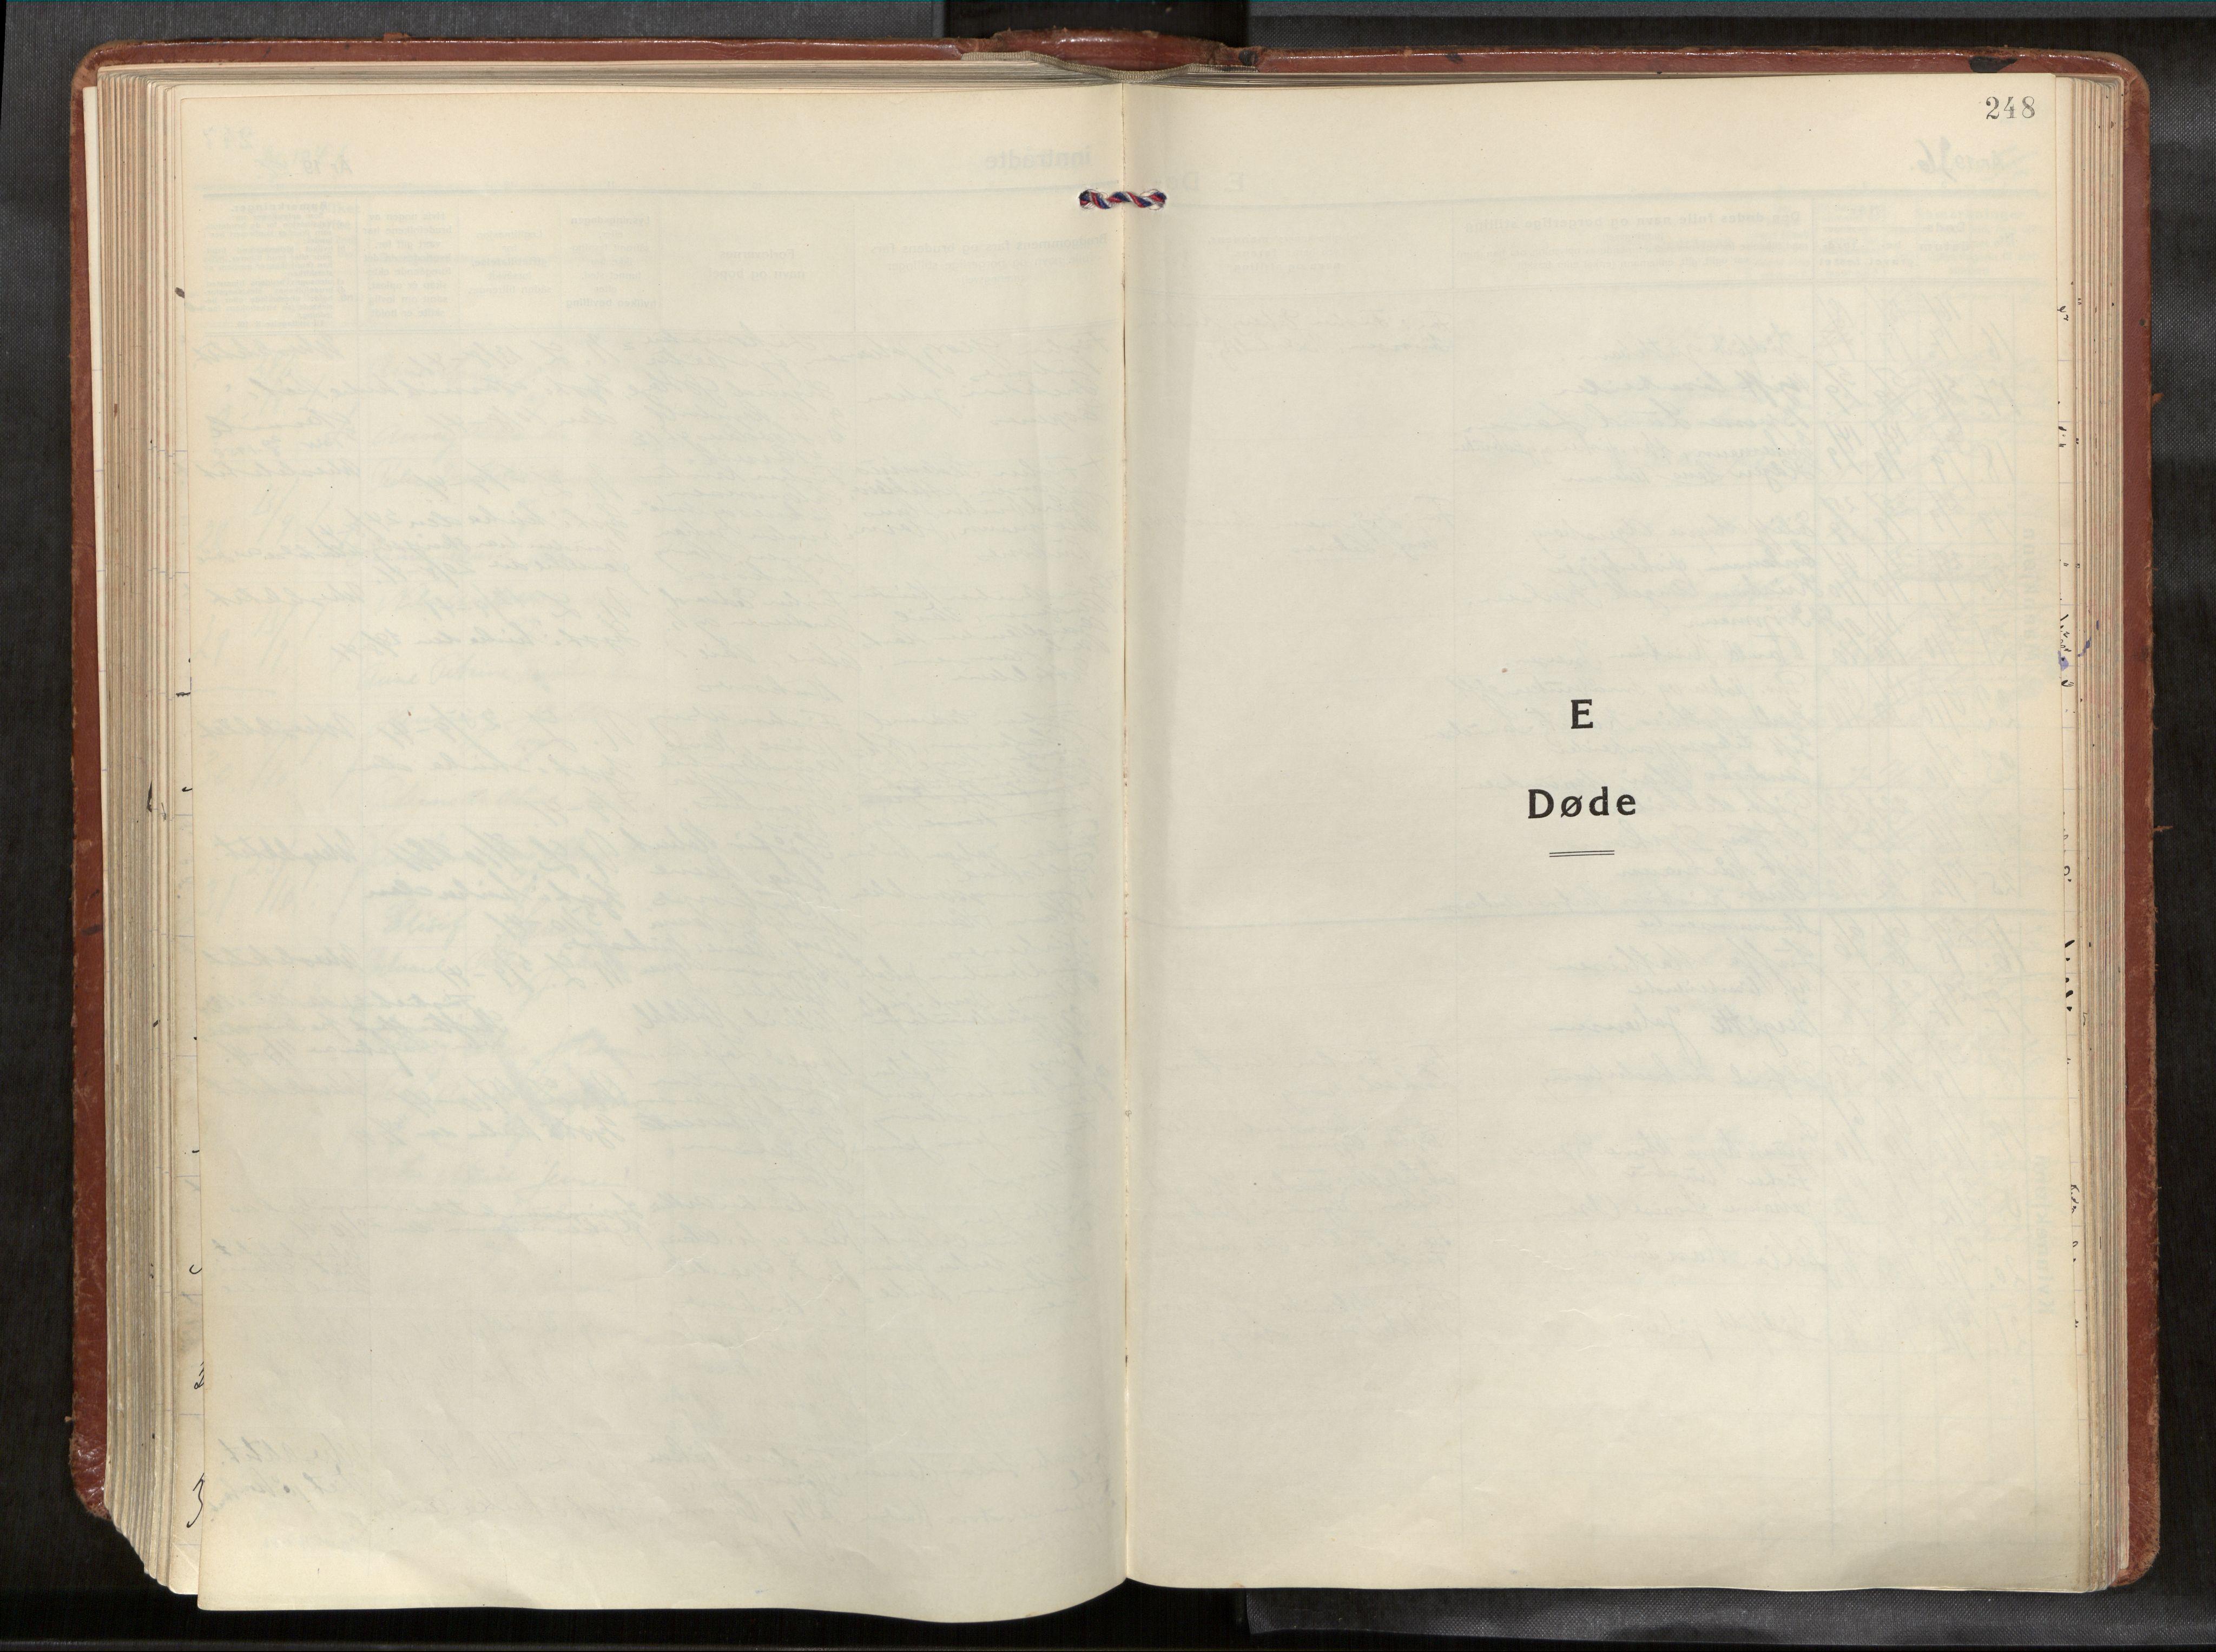 SAT, Ministerialprotokoller, klokkerbøker og fødselsregistre - Nordland, 881/L1161: Ministerialbok nr. 881A14, 1932-1955, s. 248